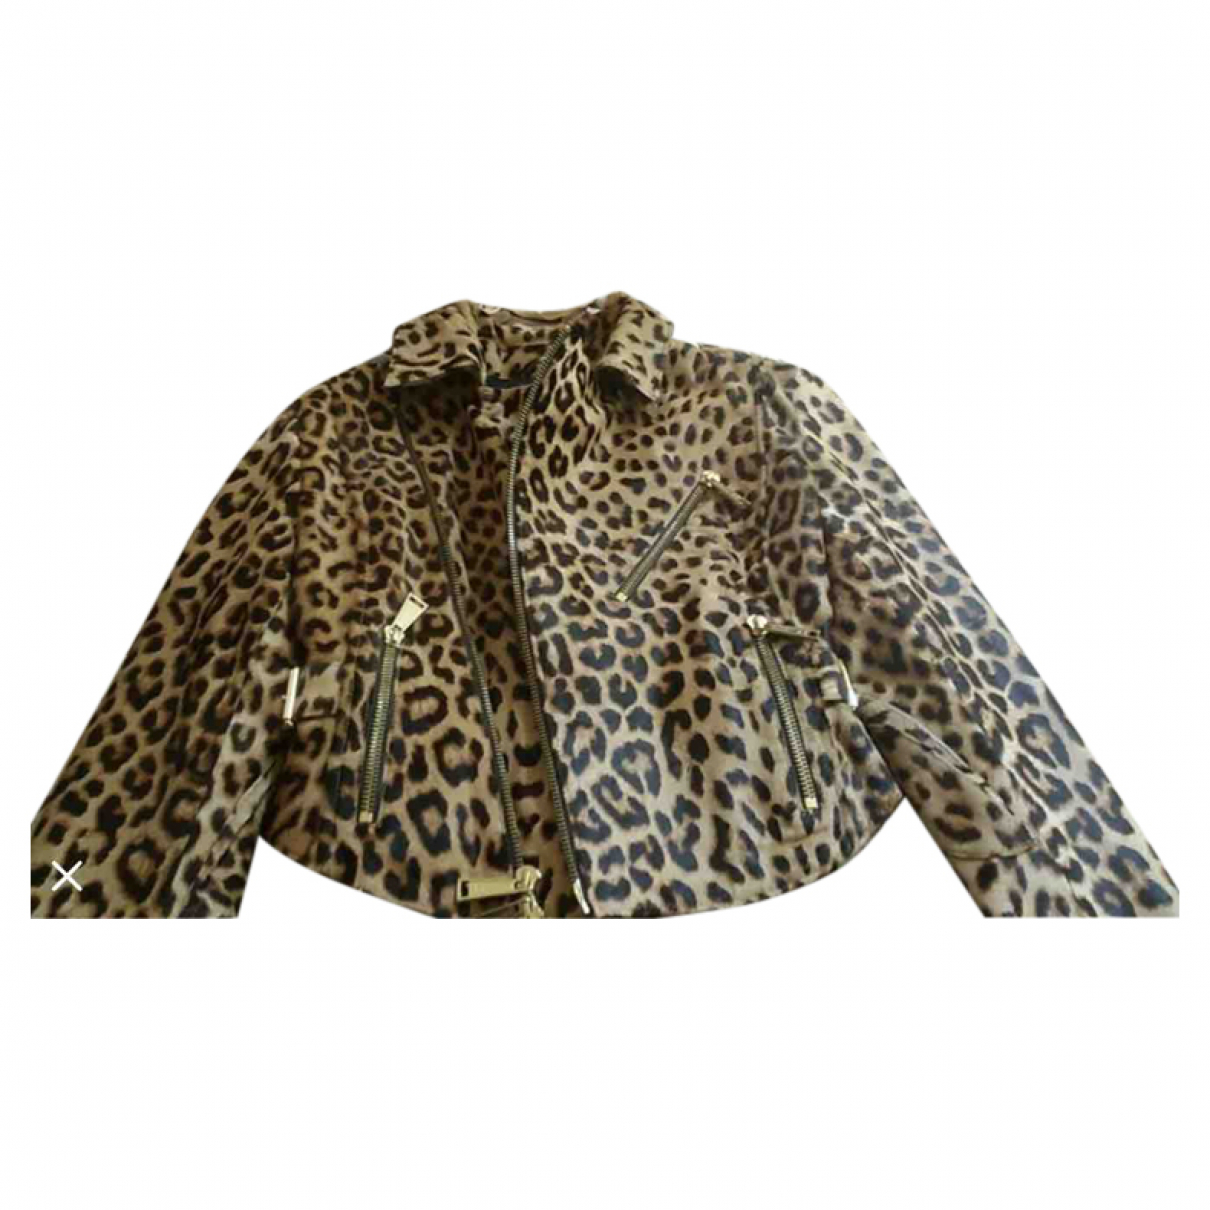 Philipp Plein \N Fur coat for Women S International